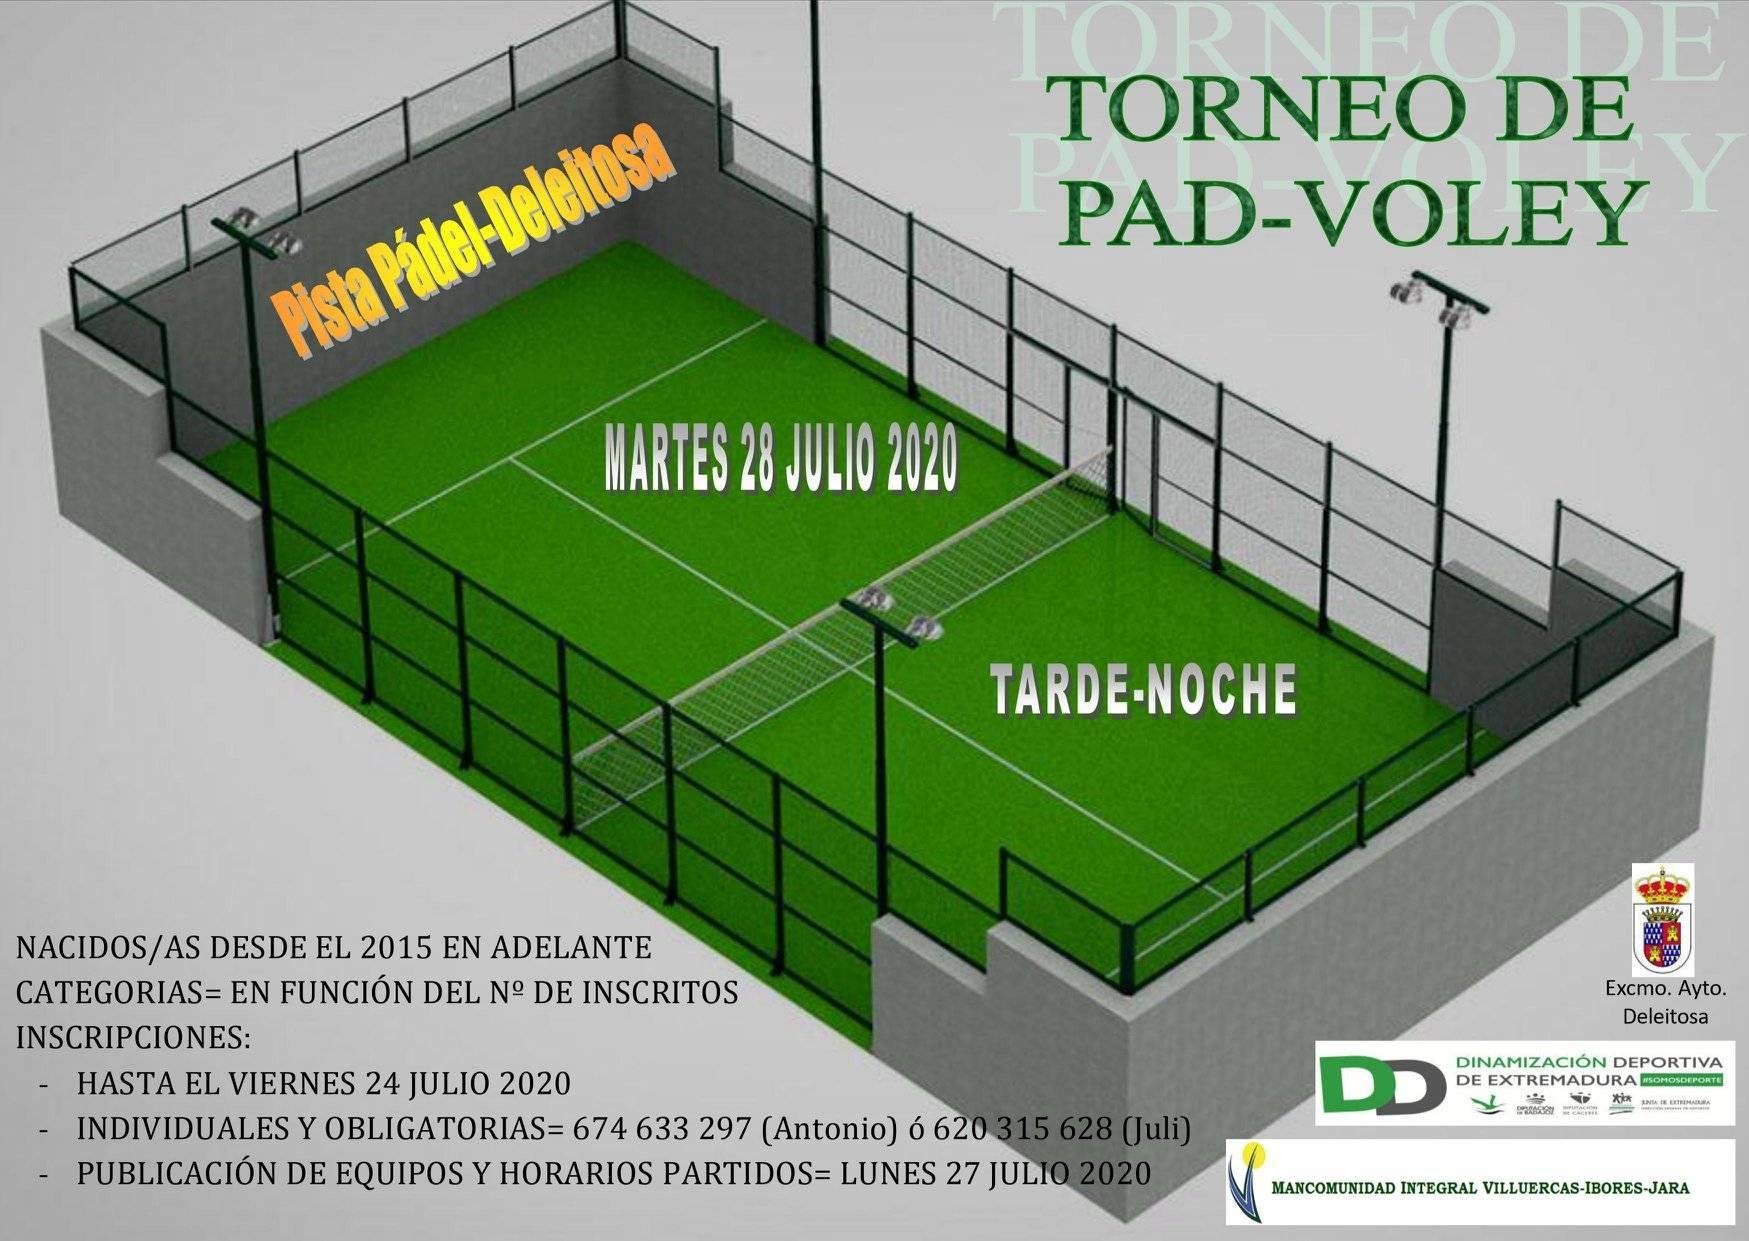 Torneo de pad-voley 2020 - Deleitosa (Cáceres)